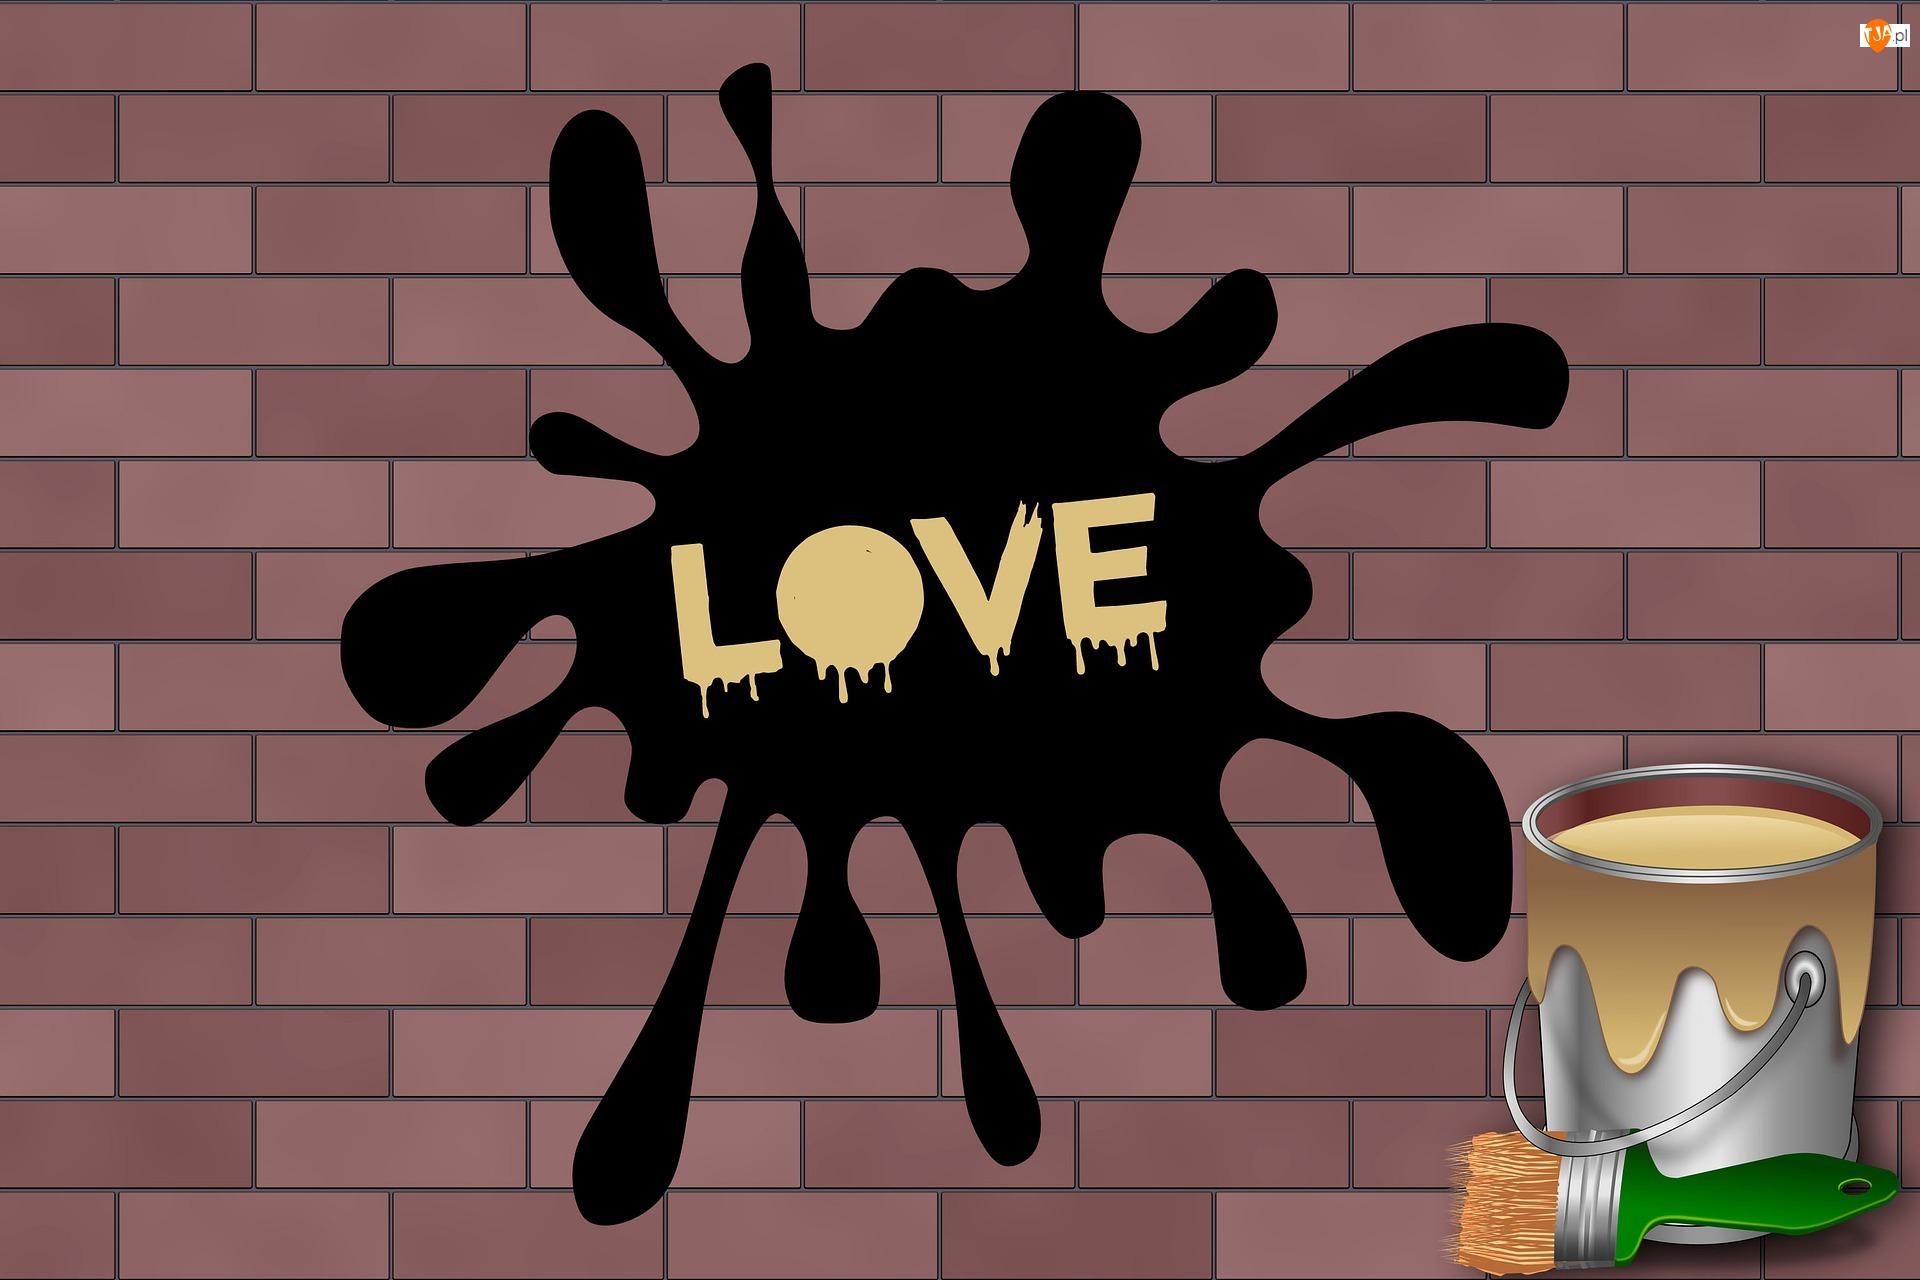 Farba, Cegła, Napis, Ściana, Mur, Love, 2D, Kleks